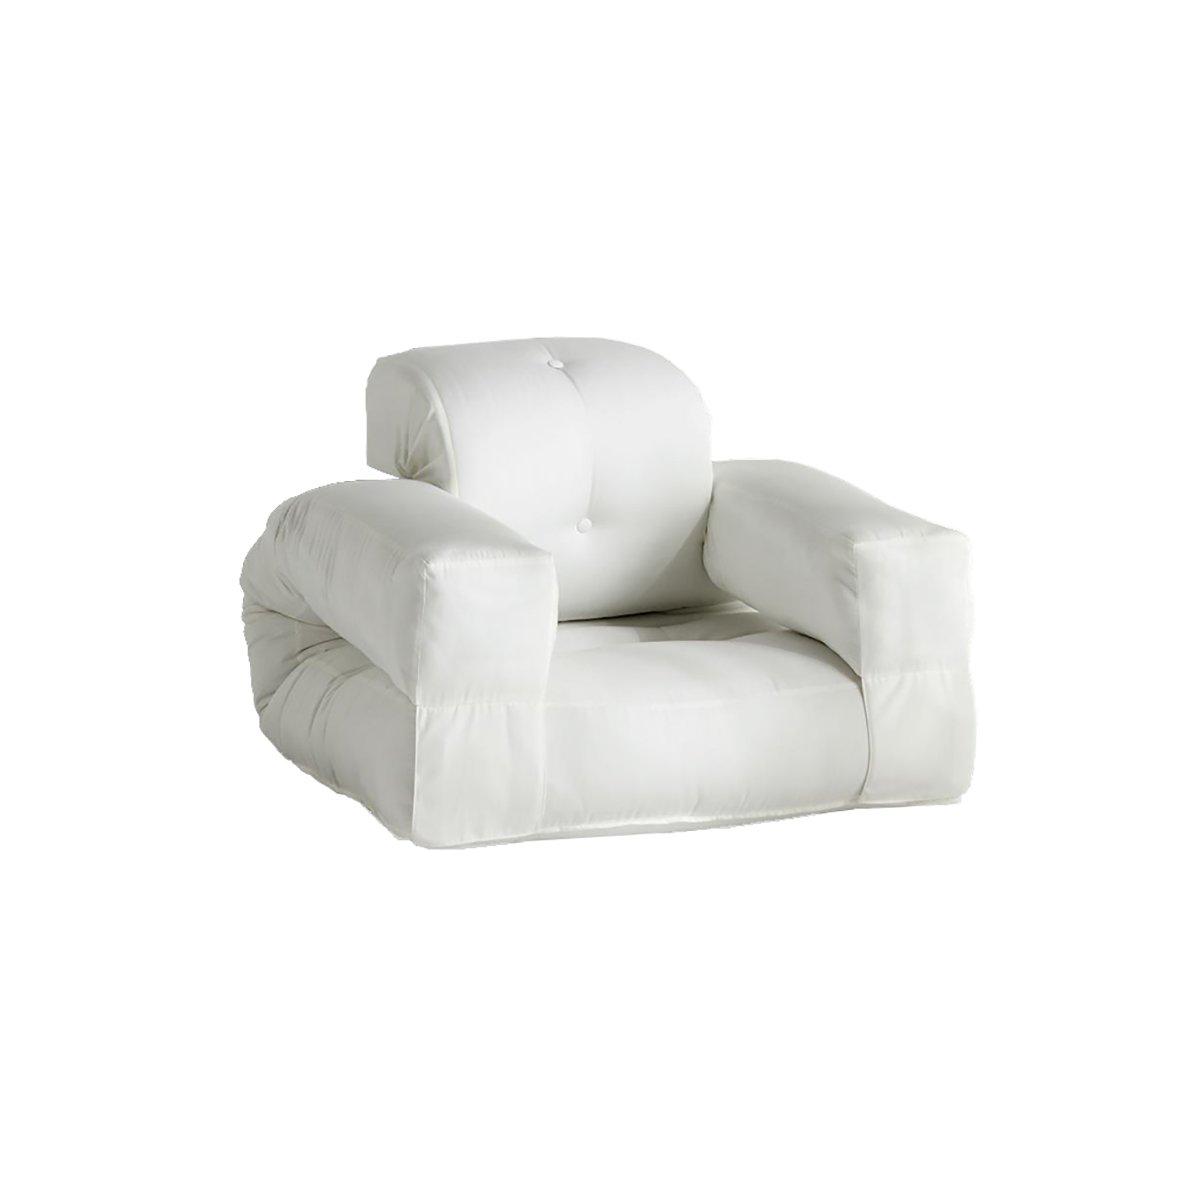 Hippo Out Chair KARUP DESIGN  DESIGNPERTEIT